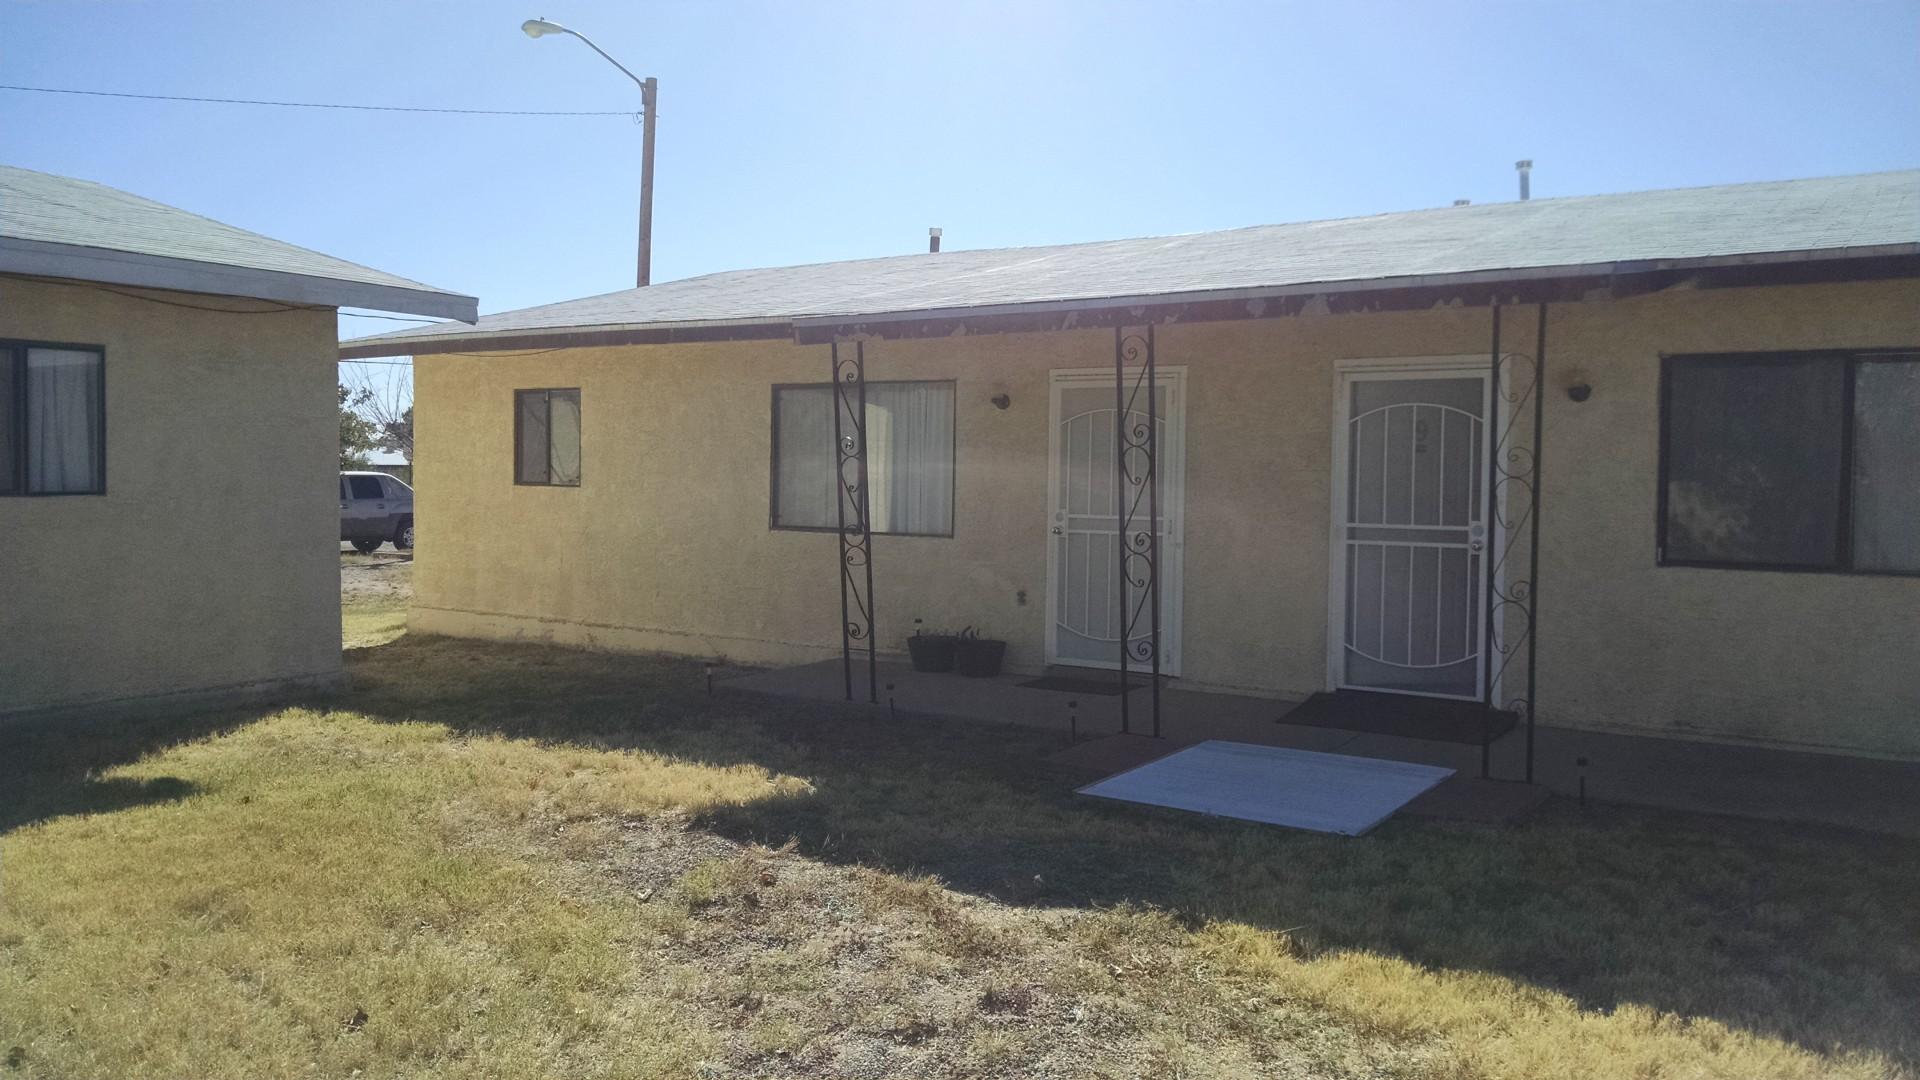 1201 S. Santa Fe. #8 - 2 Bed 1 Bath Duplex